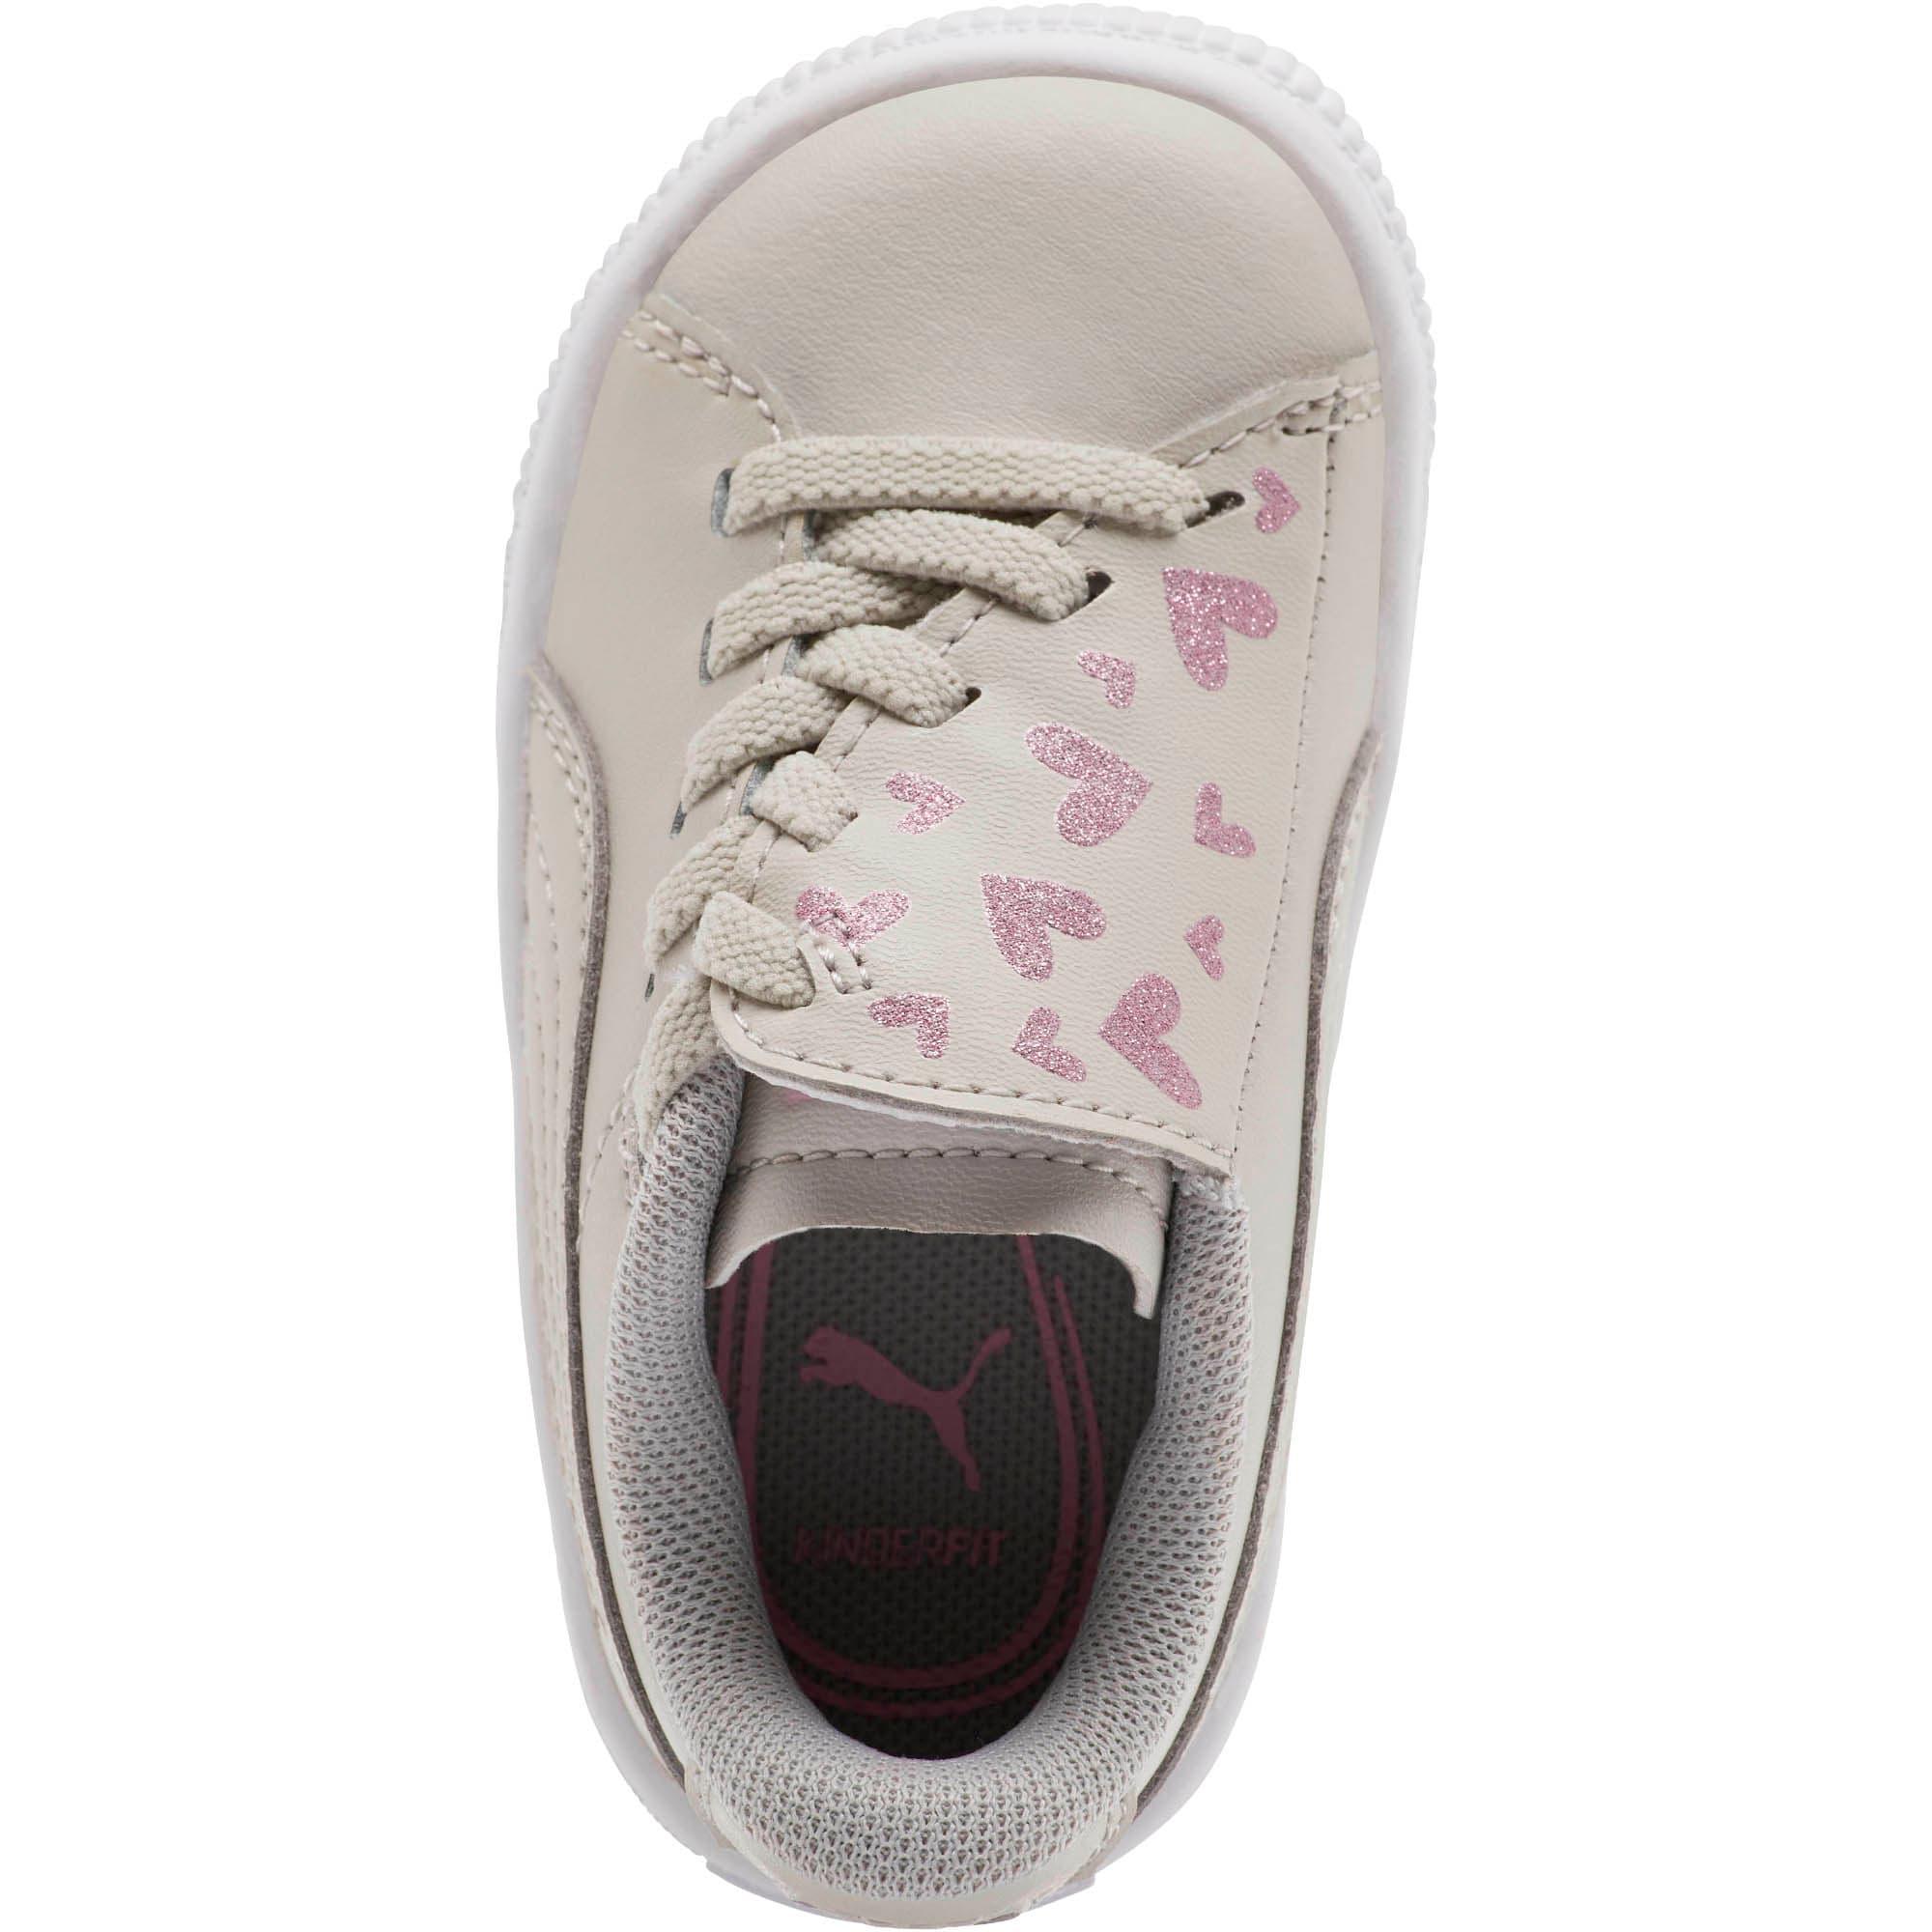 Thumbnail 5 of Basket Crush Glitter Hearts AC Toddler Shoes, Gray Violet-Puma White, medium